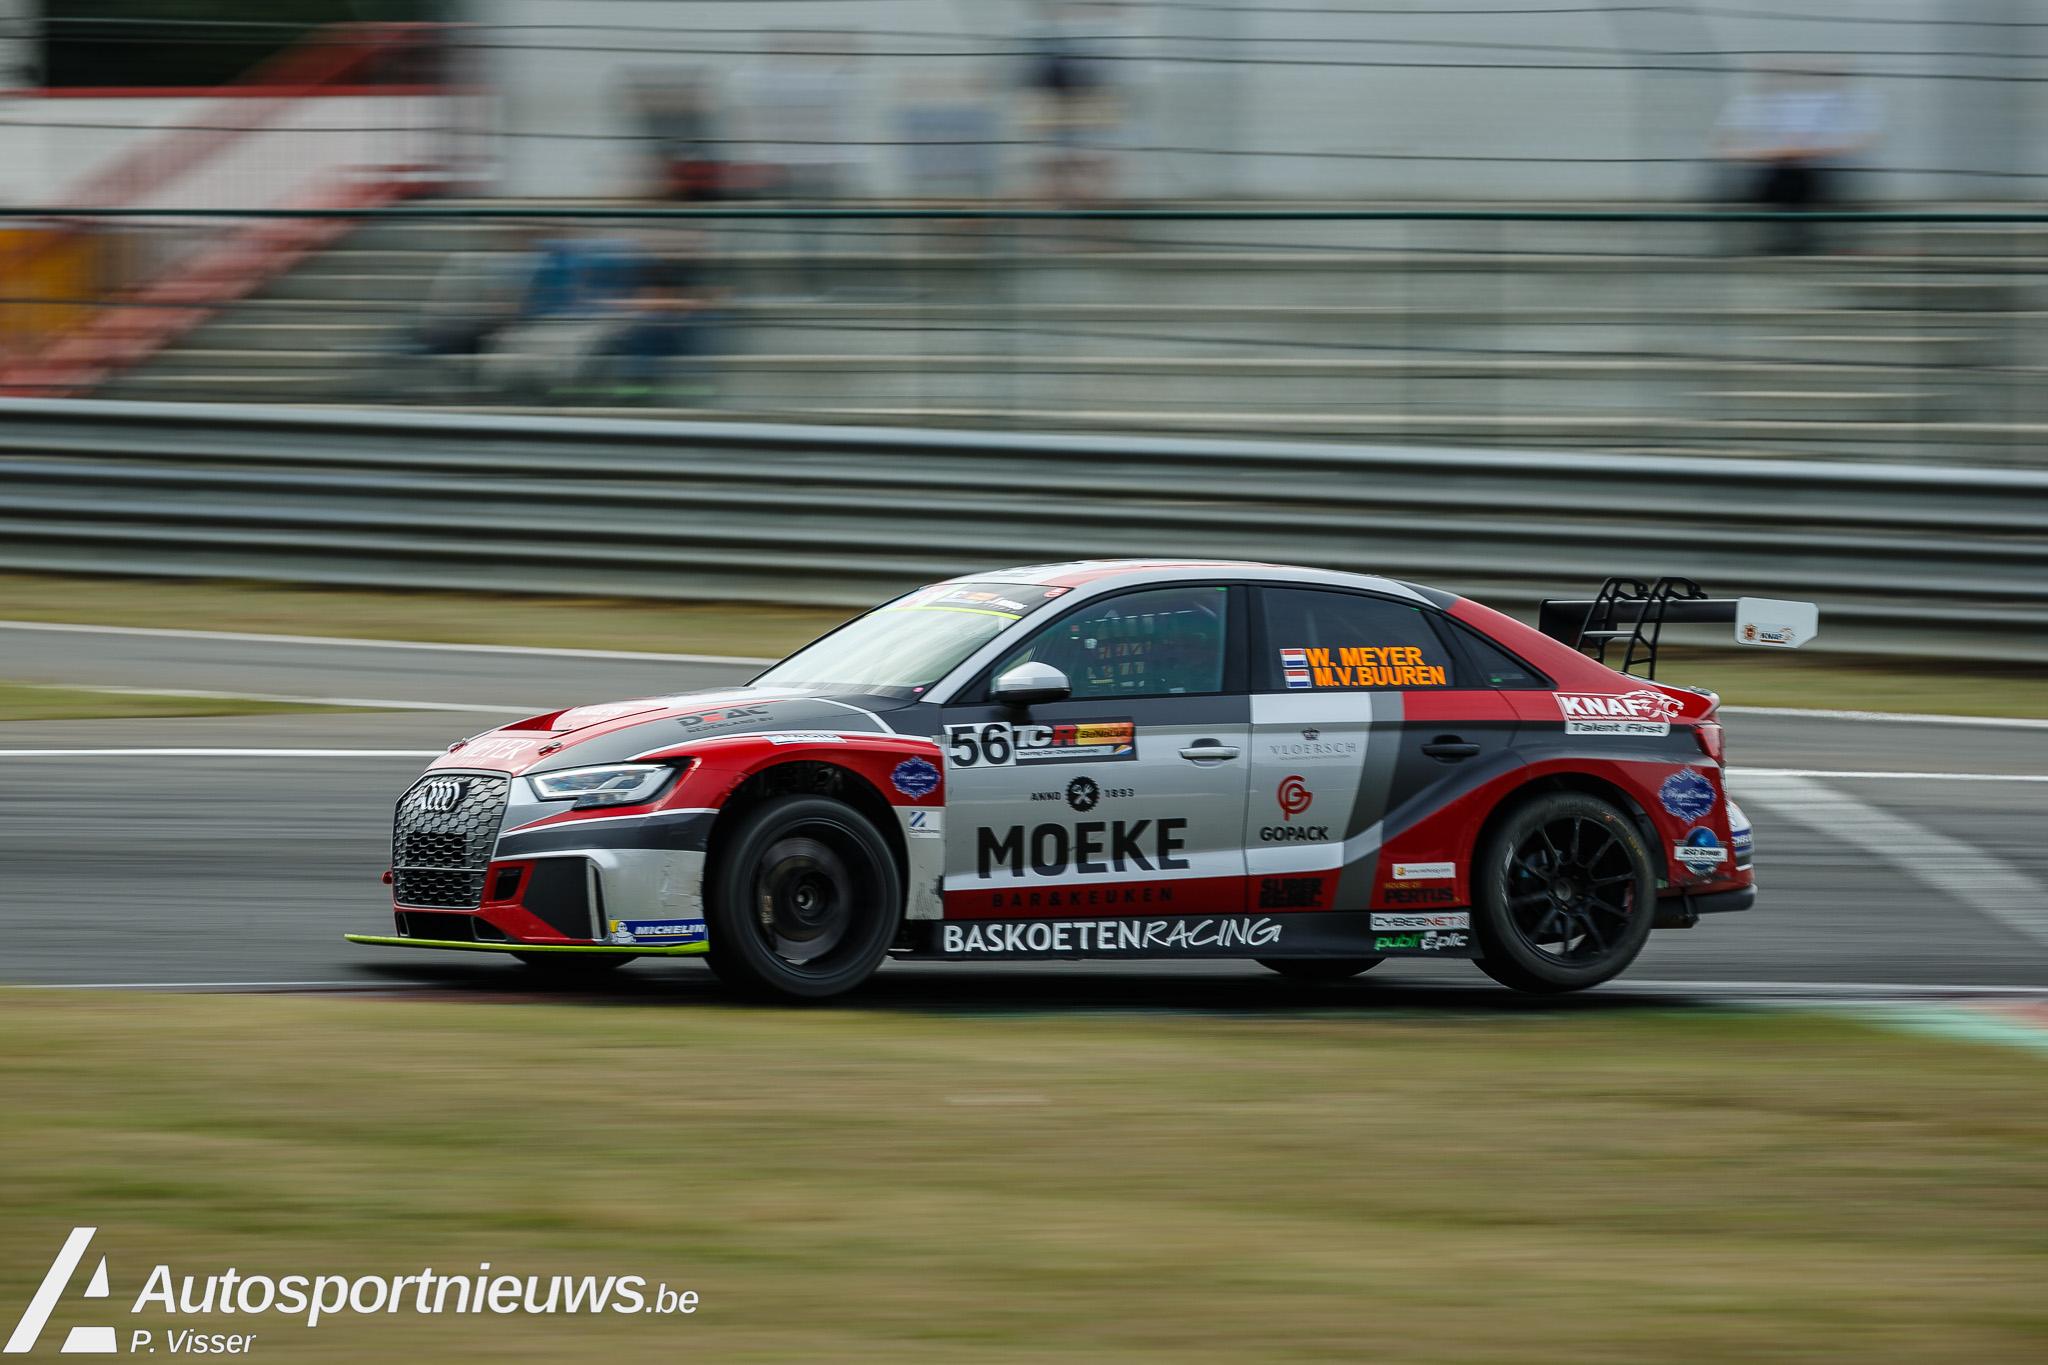 Alexis van de Poele met Audi RS3 LMS van Bas Koeten Racing